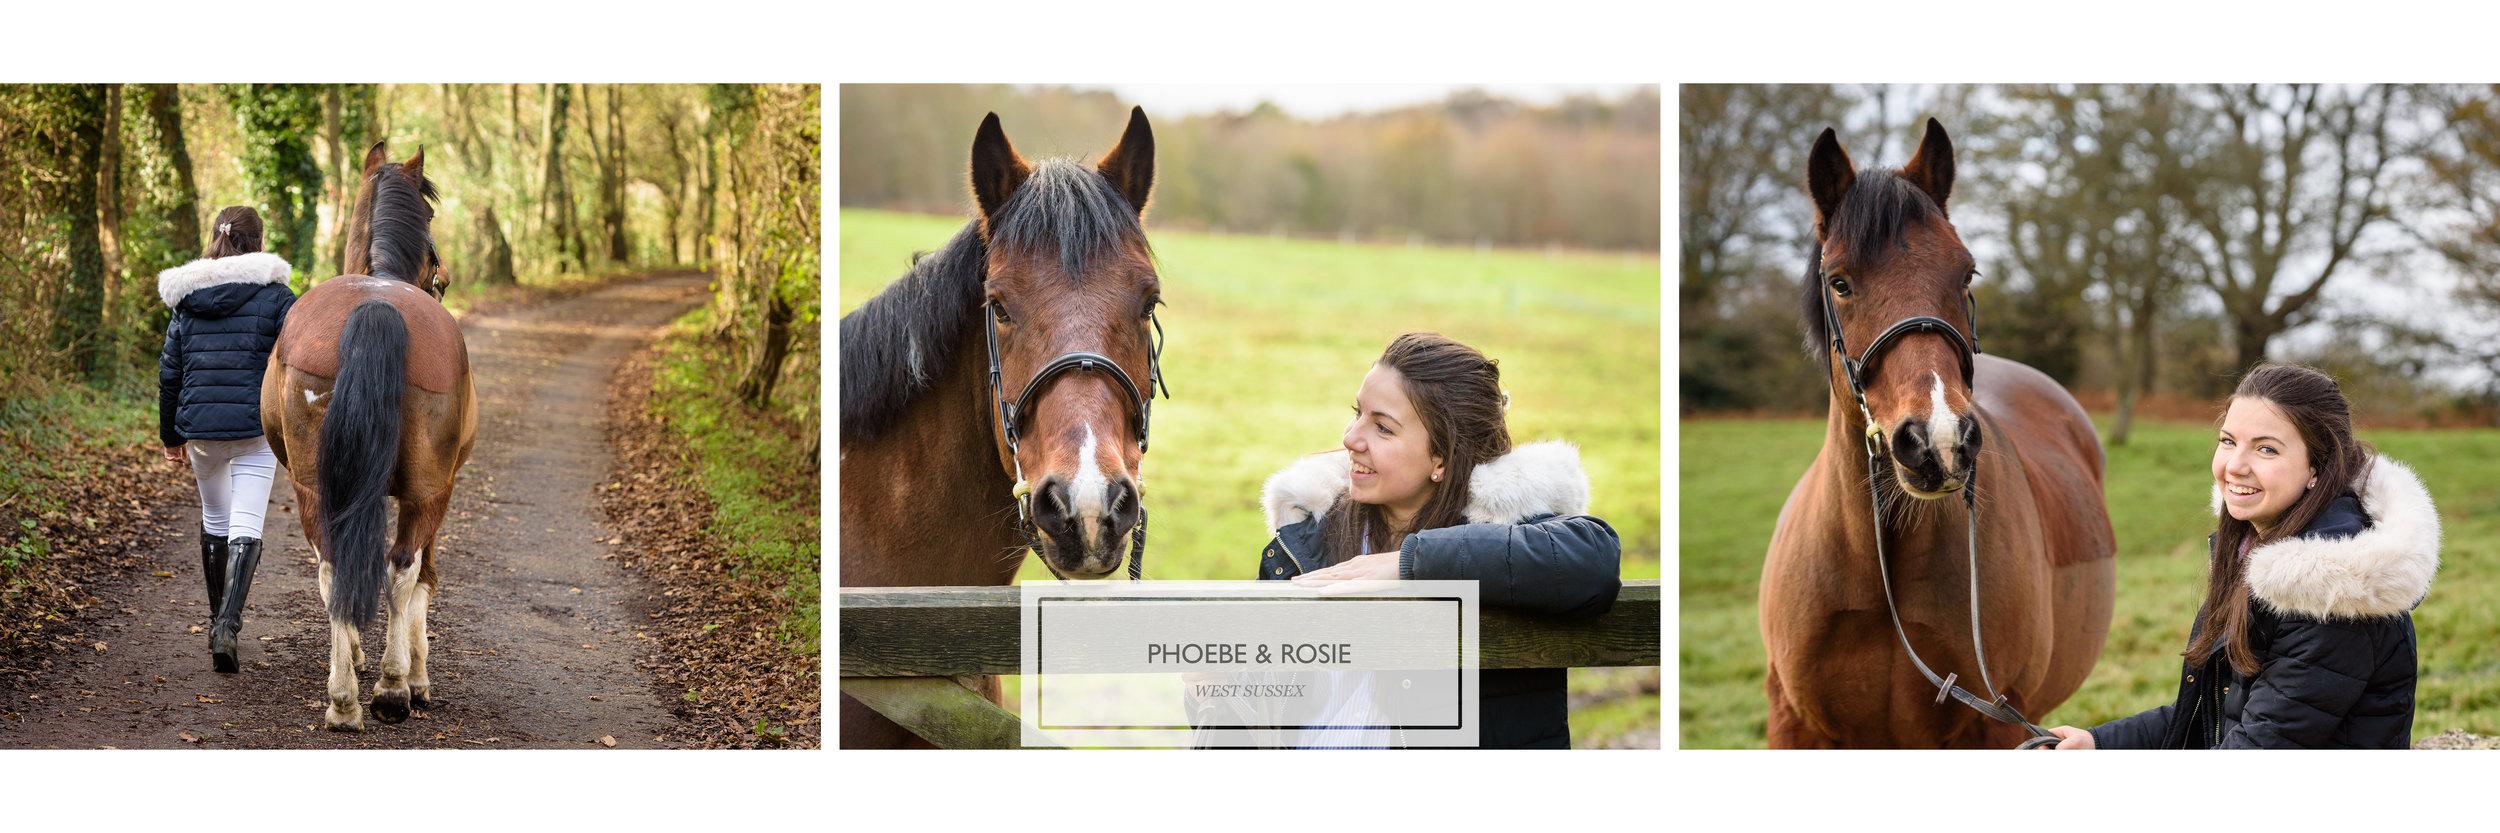 Phoebe & Rosie-10x30.jpg